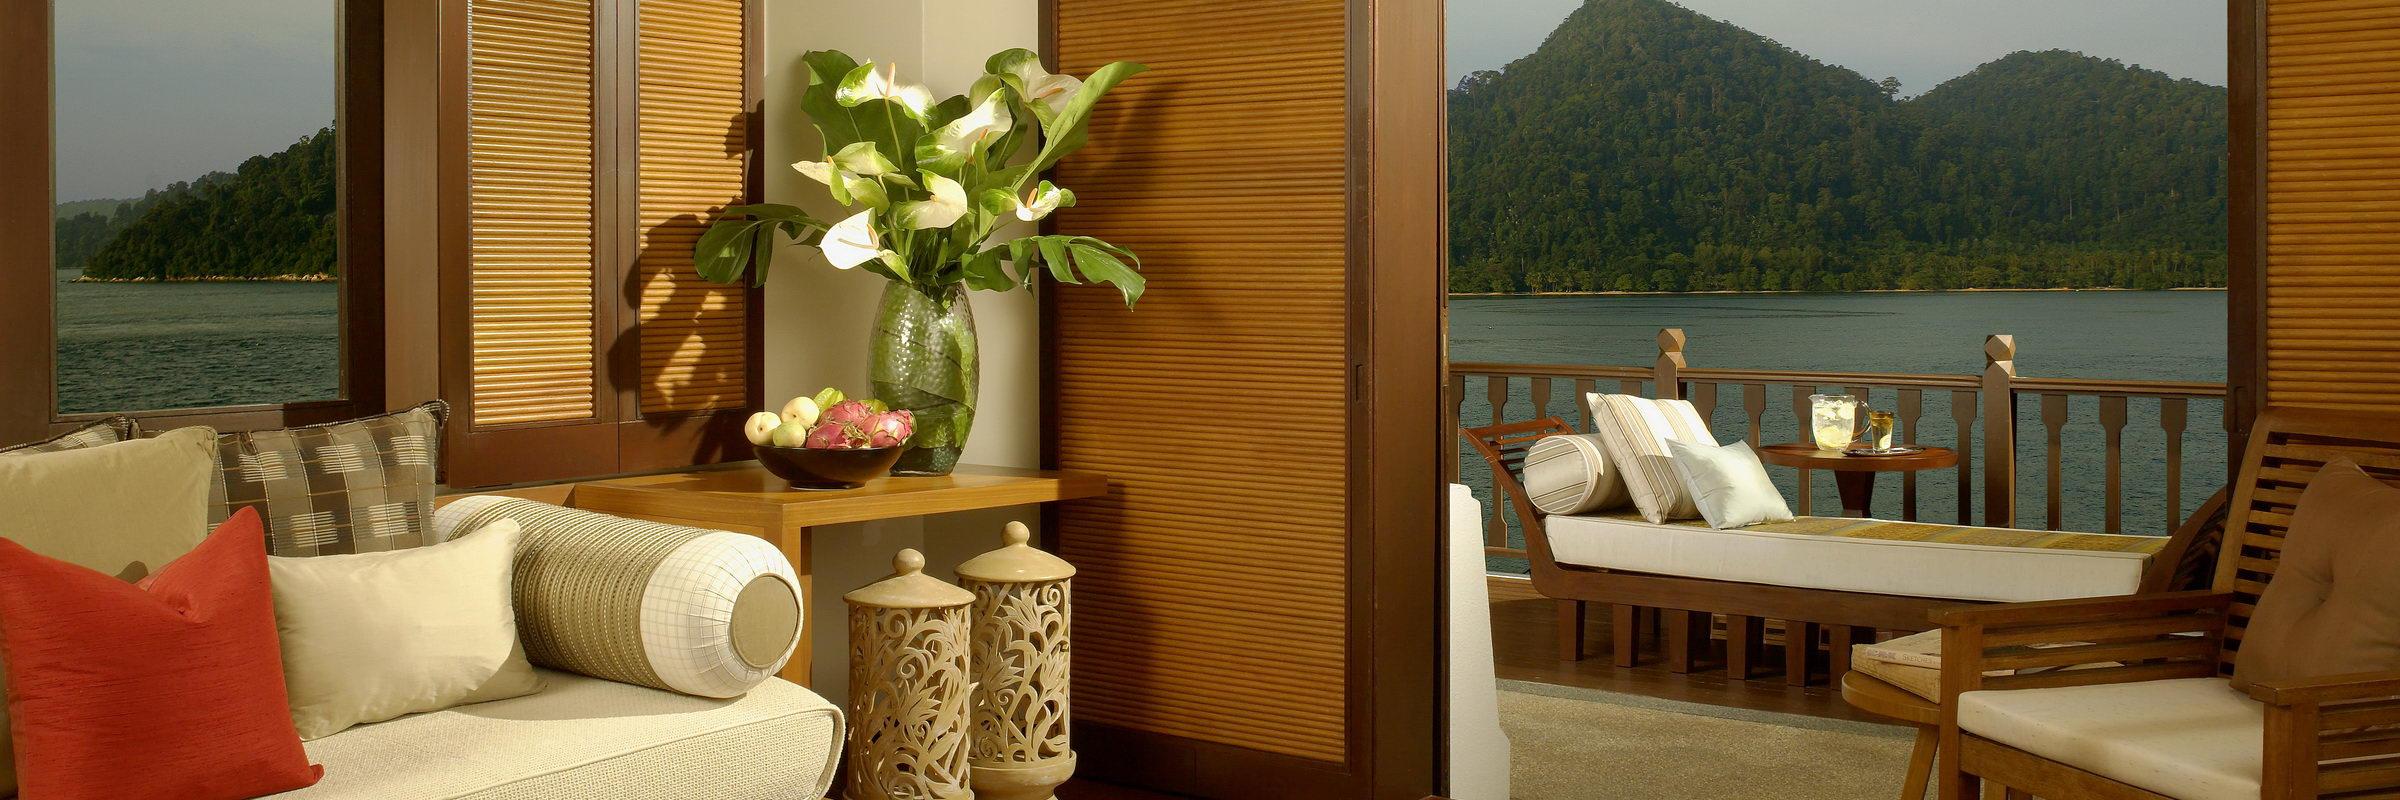 Hill Villa Zimmer im Pangkor Laut Resort in Malaysia